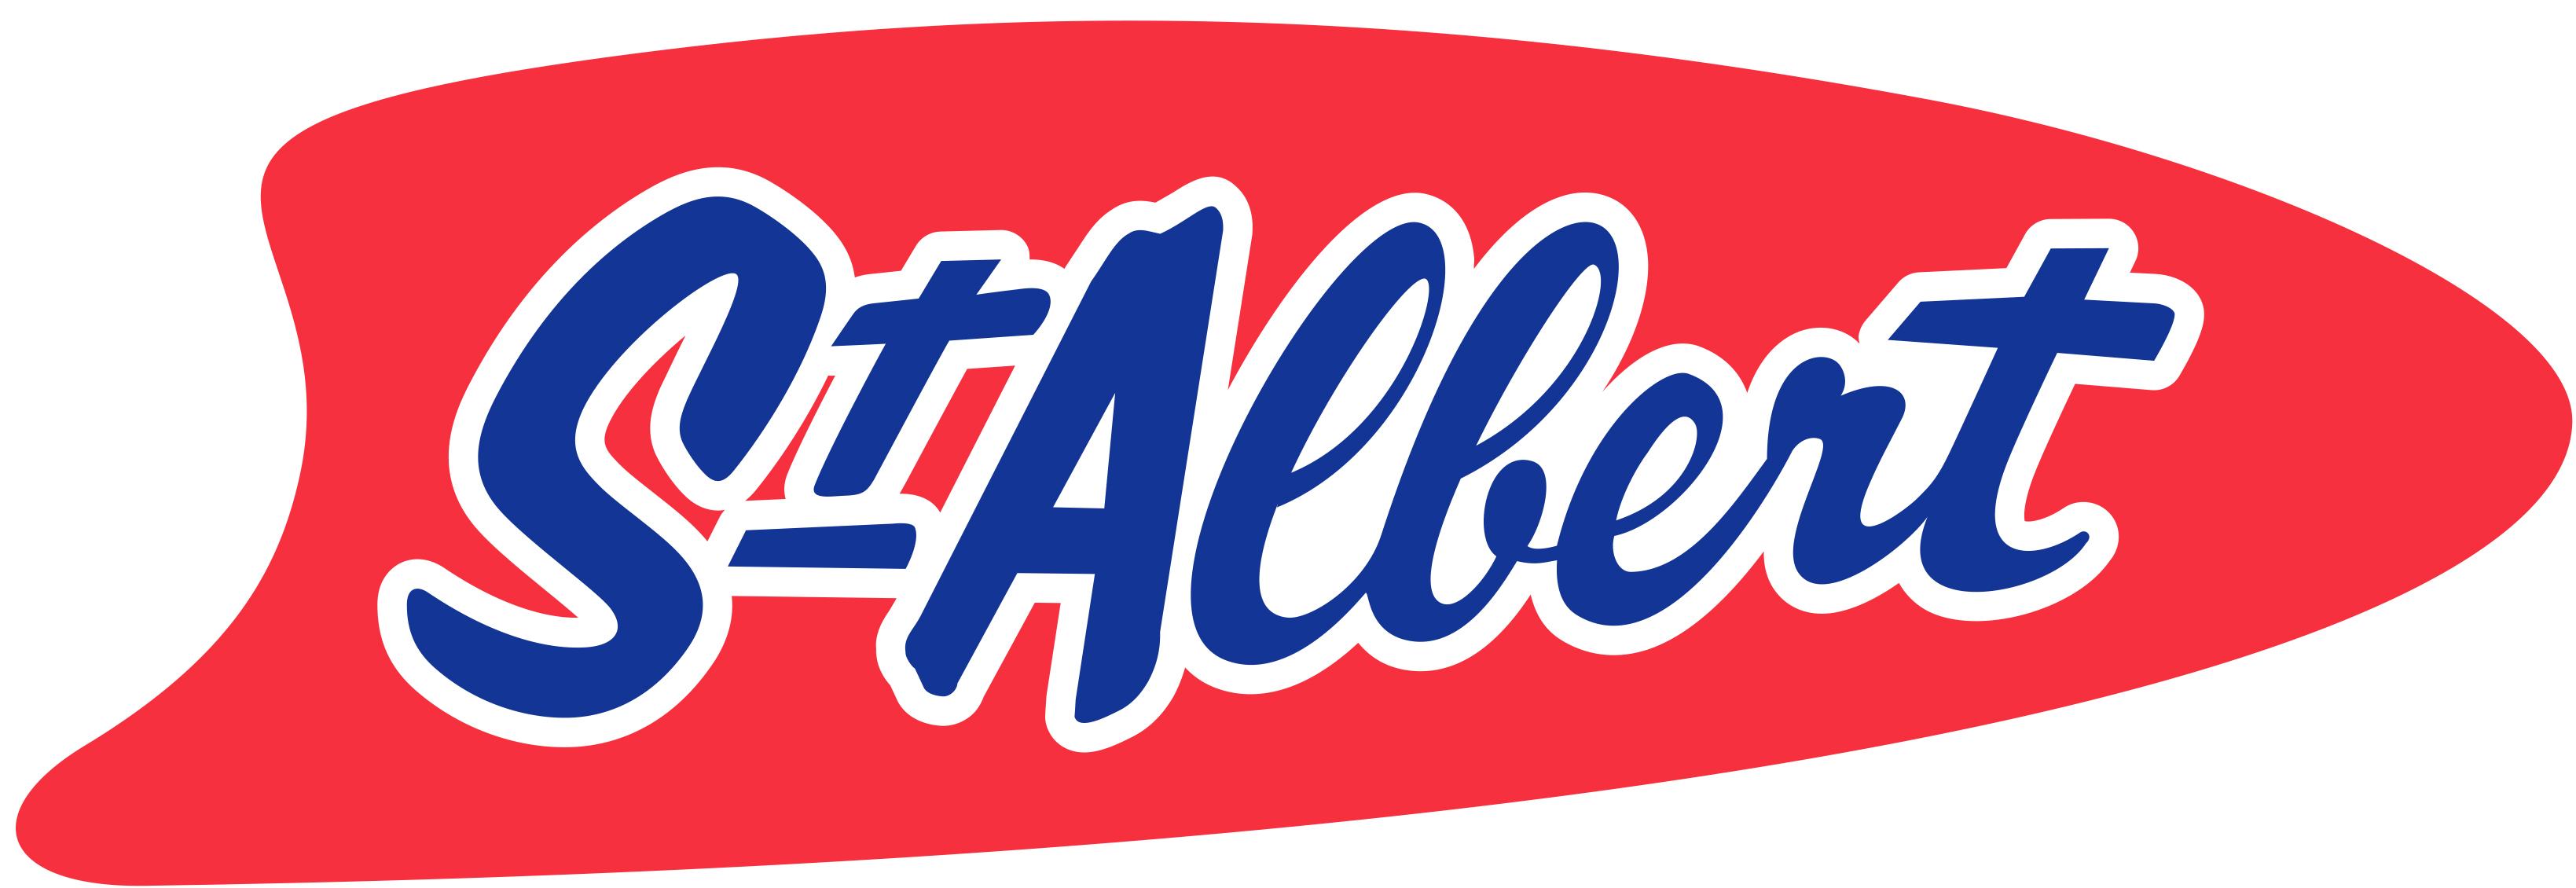 St-Albert